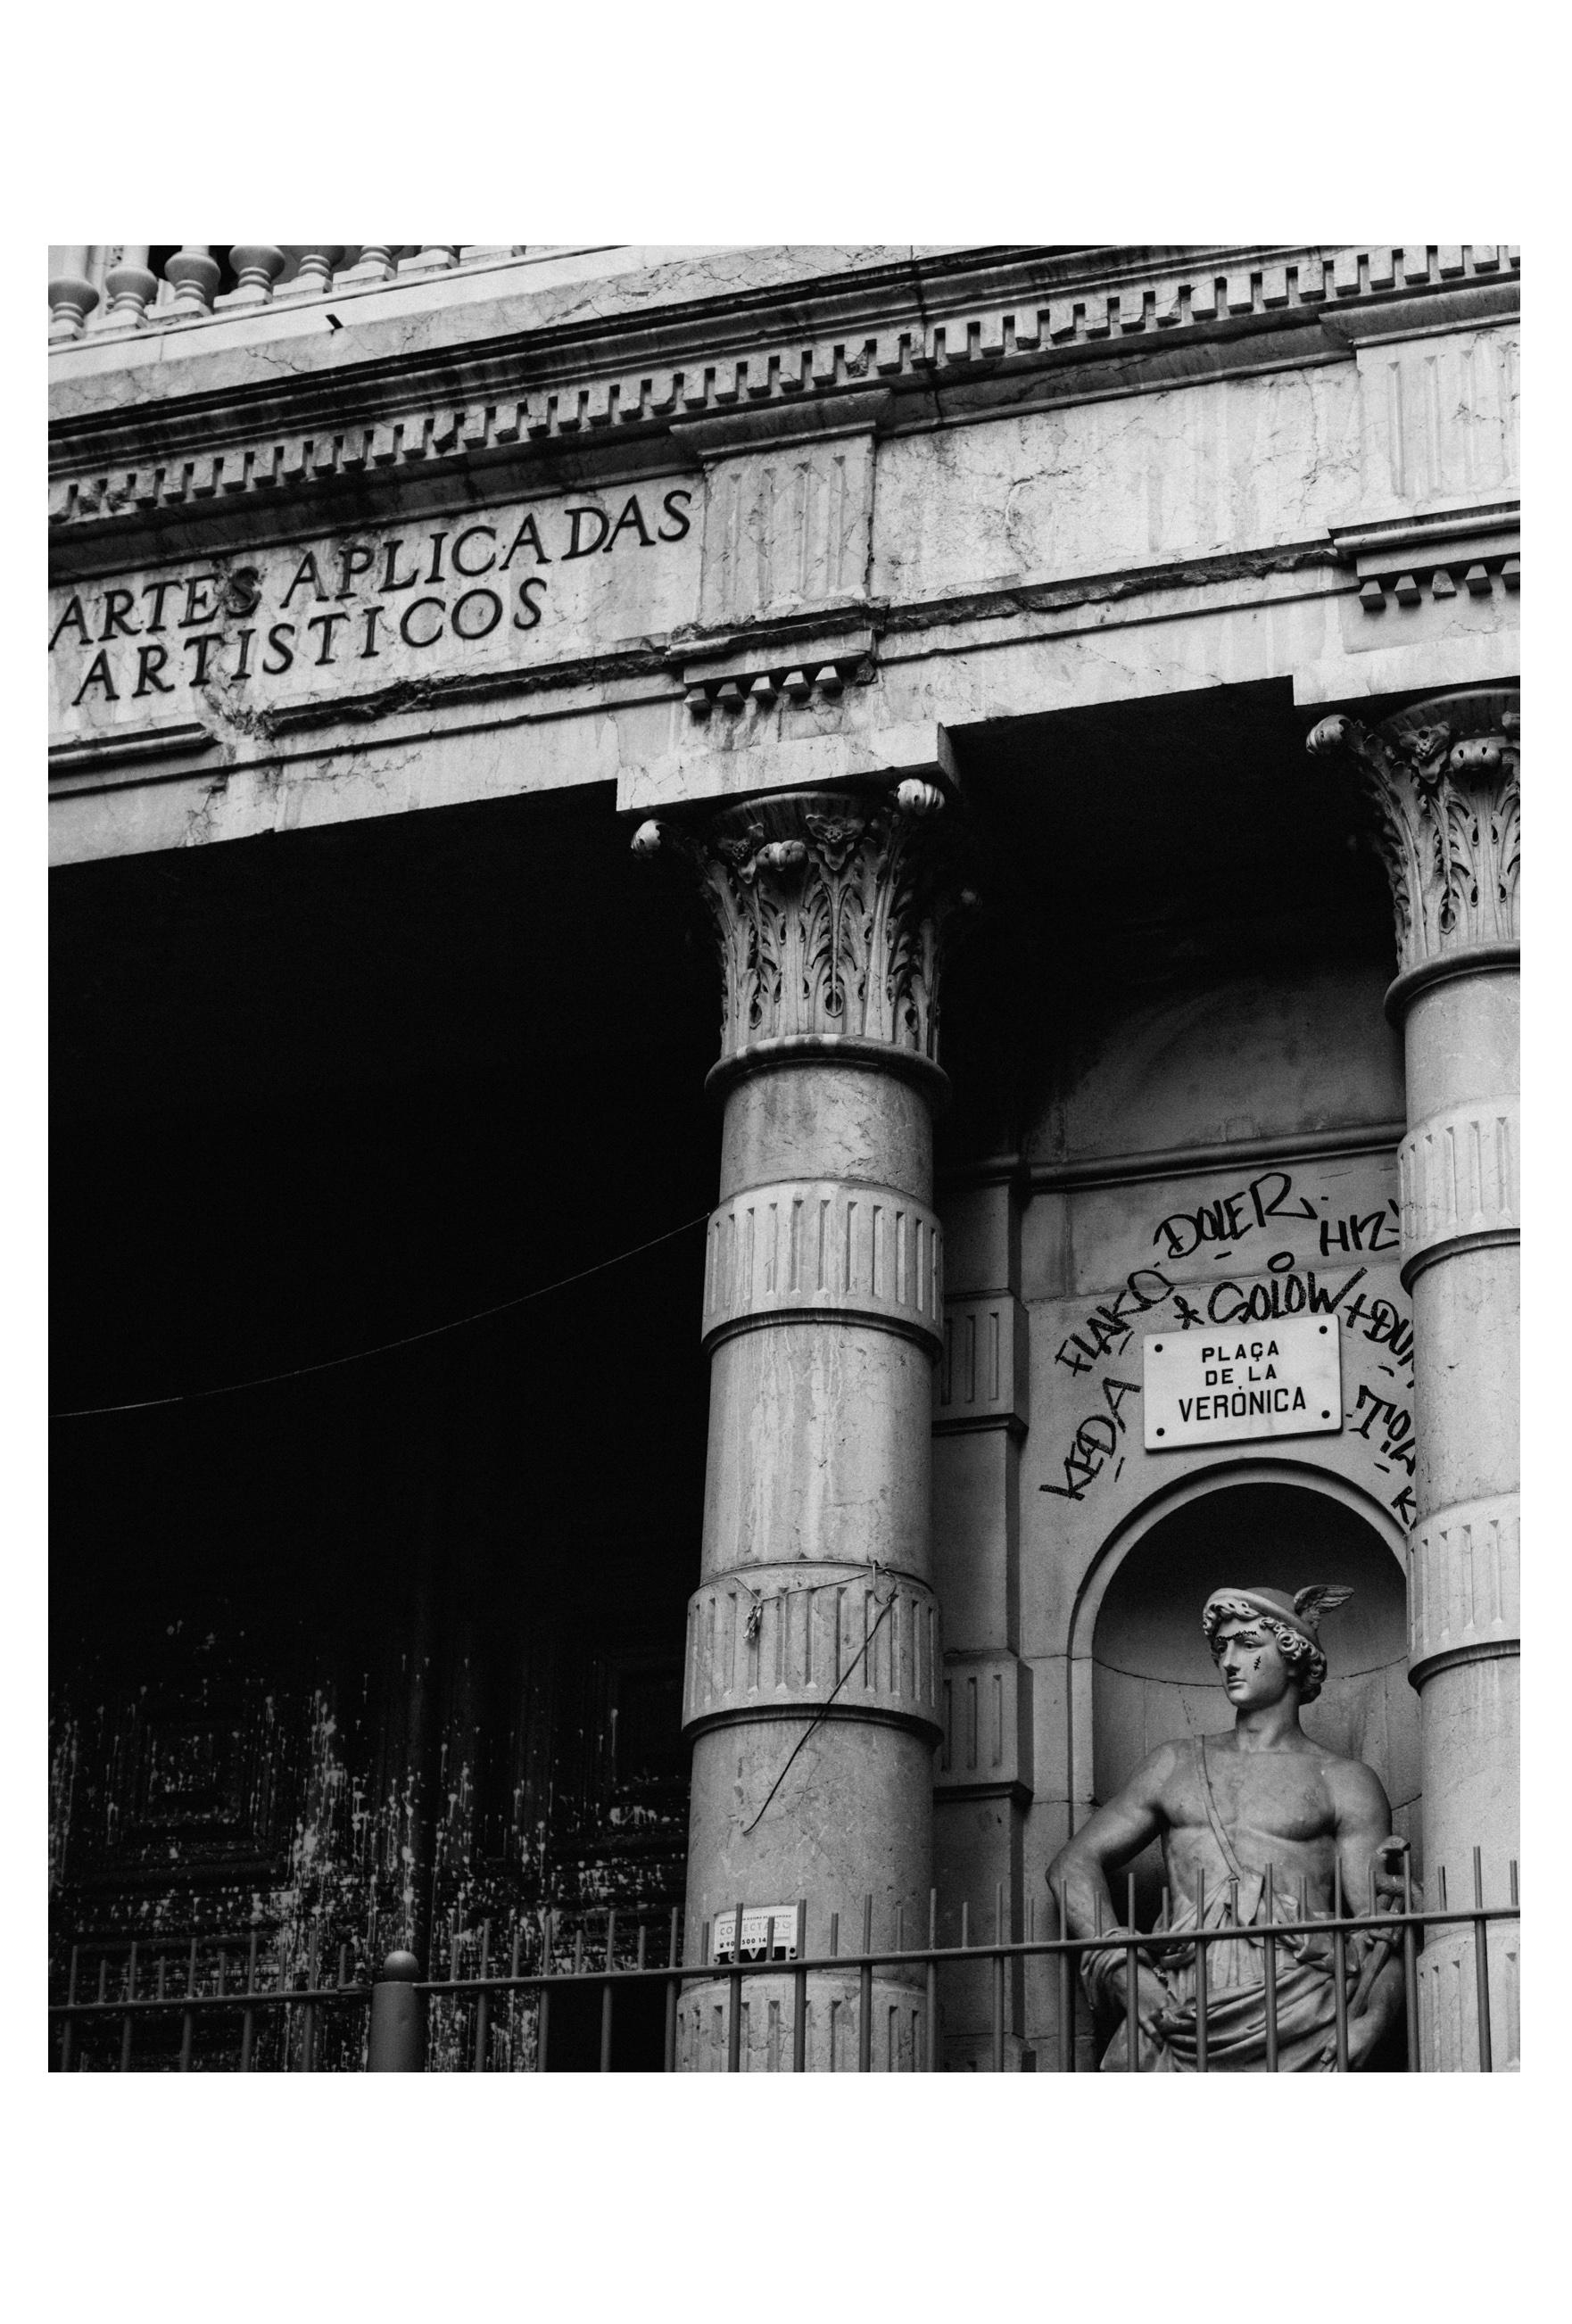 Barcelona statue tags